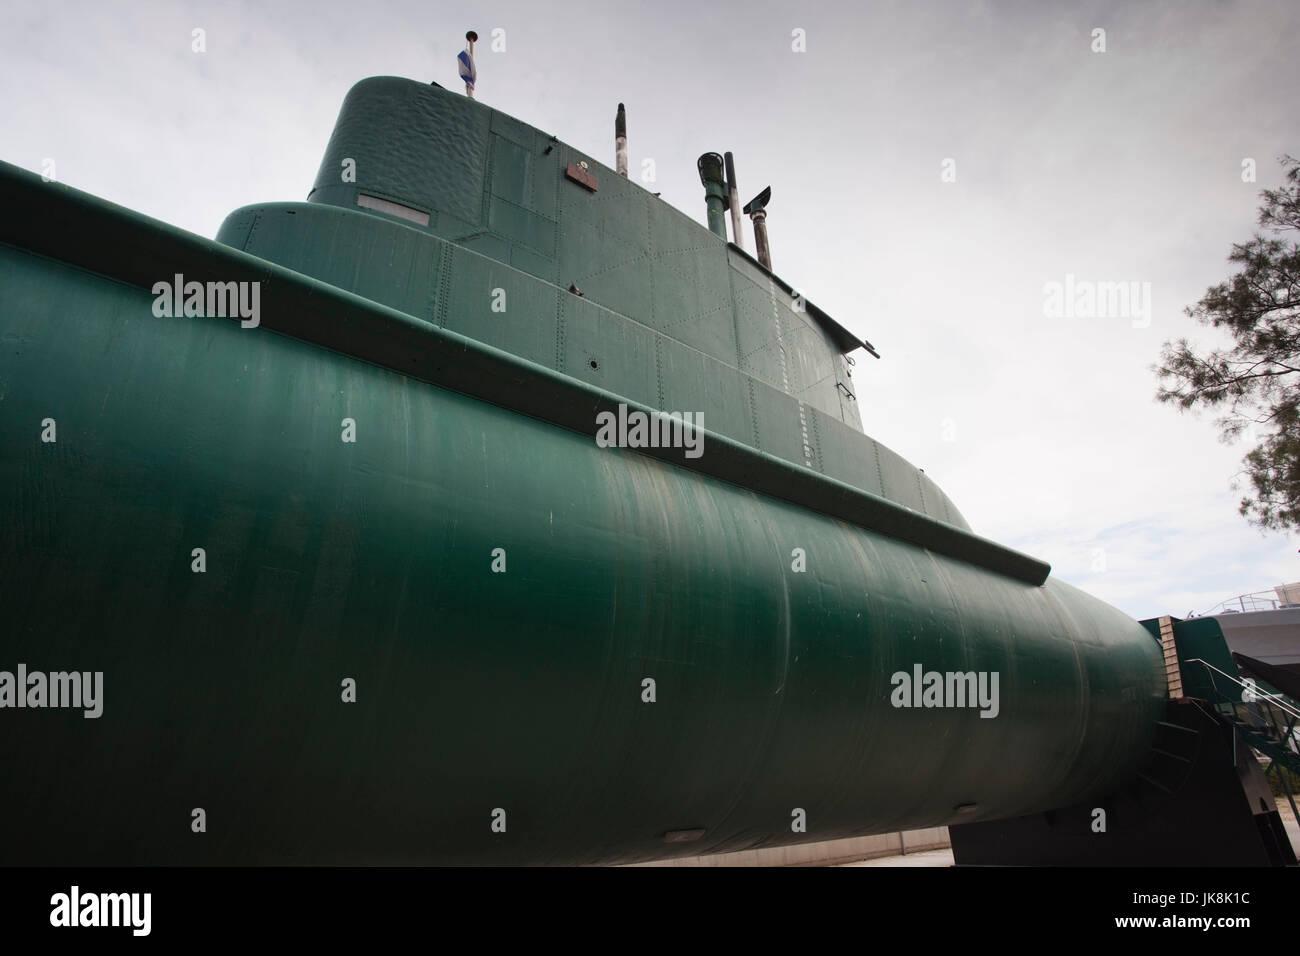 Israel, North Coast, Haifa, Clandestine Immigration and Naval Museum, INS Gal, first modern built Israeli submarine - Stock Image